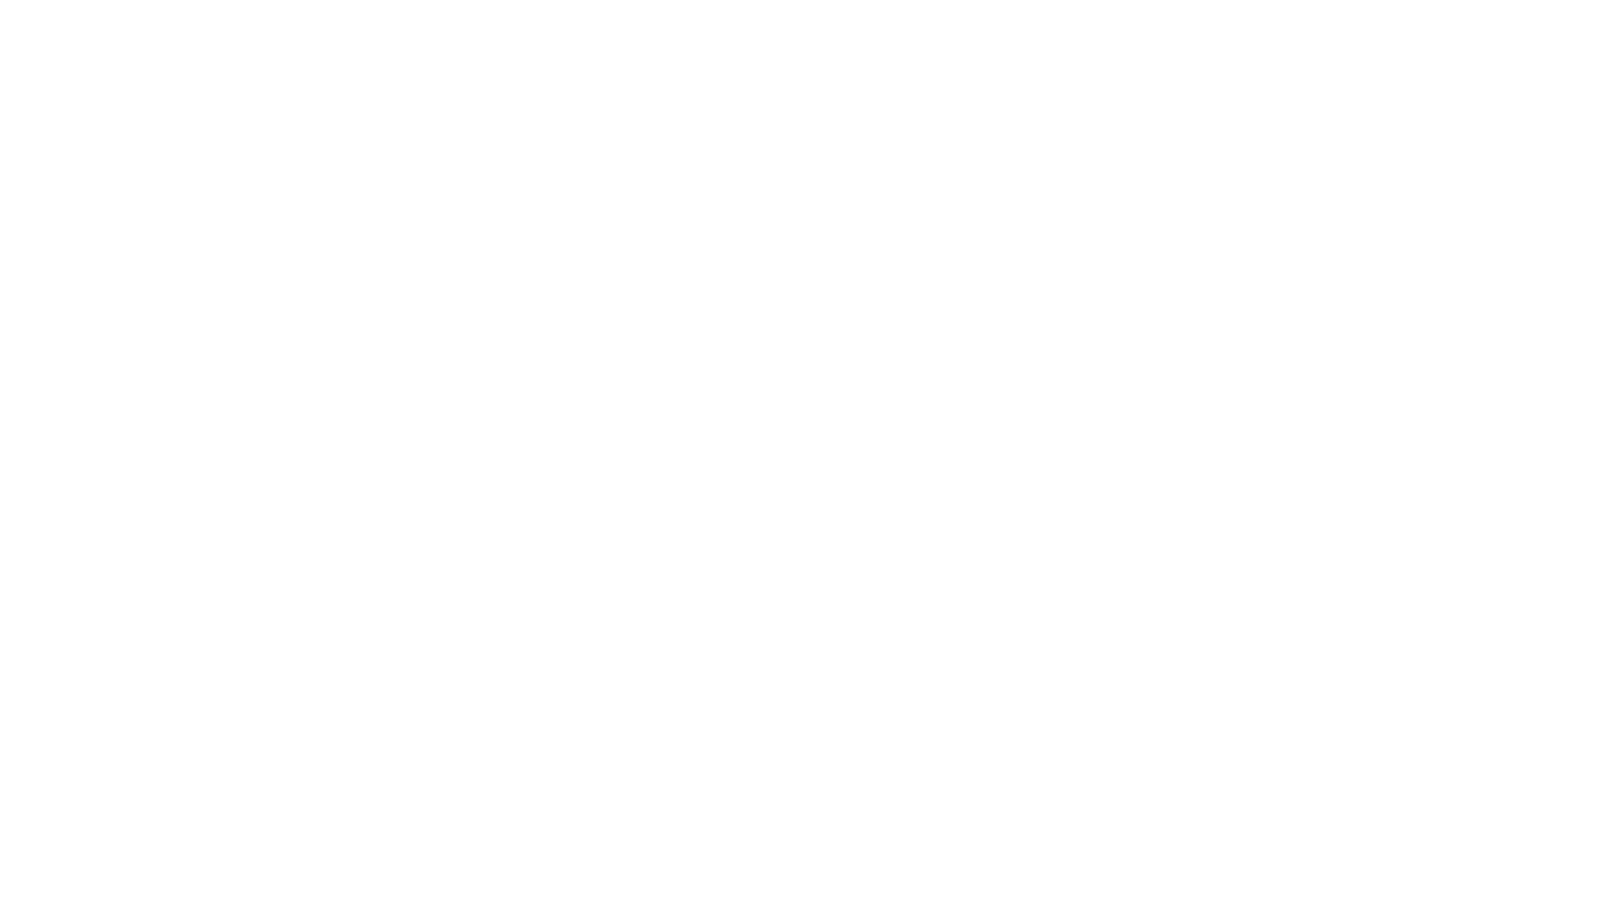 〜subtitles in 🇫🇷🇺🇸🇯🇵French/English/Japanese〜 How fun !! I could meet one of my Japanese friends who was in the same french language school in south of France with me & her french husband during their road trip by camping car in Shikoku Island !!😃 I tried to get some Hints for the road trip in Shikoku Island💖💖😁  ※I'm so sorry, there is too much noise in this video because of the strong wind, lawn mower and trains stop & go. 😂😂Hope you could enjoy this video with relaxing cafe music ☕️♫ & sub titres.   Hope to see you again in our next video !! Thank you for watching !!!  ✴︎ABOUT✴︎ Hello, I'm Ayaka. Local Japanese Une Tokyoite🌟 This spring, I moved from Tokyo to Shikoku Island in southern Japan, popular among Japanese (it's like the Mediterranean islands of Japan) but still unrecognized by foreign tourists. I started to discover this island little by little! In this series, I will share with you the beautiful landscapes of Shikoku by talking about Japanese life, culture, style and opinions, etc, which will be interesting for you !! Also, I write in French, English and Japanese so you can study Japanese as well !! Talking about interesting things, our memories and daily life, let's enjoy the video together !! 😃  Bonjour ! C'est Ayaka, Japonaise locale Une Tokyoite !! Ce printemps, j'ai déménagé de Tokyo à l'ile de Shikoku, dans le sud du Japon, populaire parmi les Japonais (c'est comme les îles sur Méditerranée du Japon) mais encore méconnu pour les tourists étrangers. J'ai commencé à découvrir cette île petit à petit ! Dans cette série, je vous partagerai les beaux paysages de Shikoku en parlant la vie japonaise, culture, style et avis, etc, qui seront intéressants pour vous !! En plus, je vais écrire sous-titre français, anglais et japonais aussi pour que vous puissiez apprendre le japonais en même temps !  Découvrons ensemble cette île, parlons des choses intéressantes, amusons ensemble !! 😄